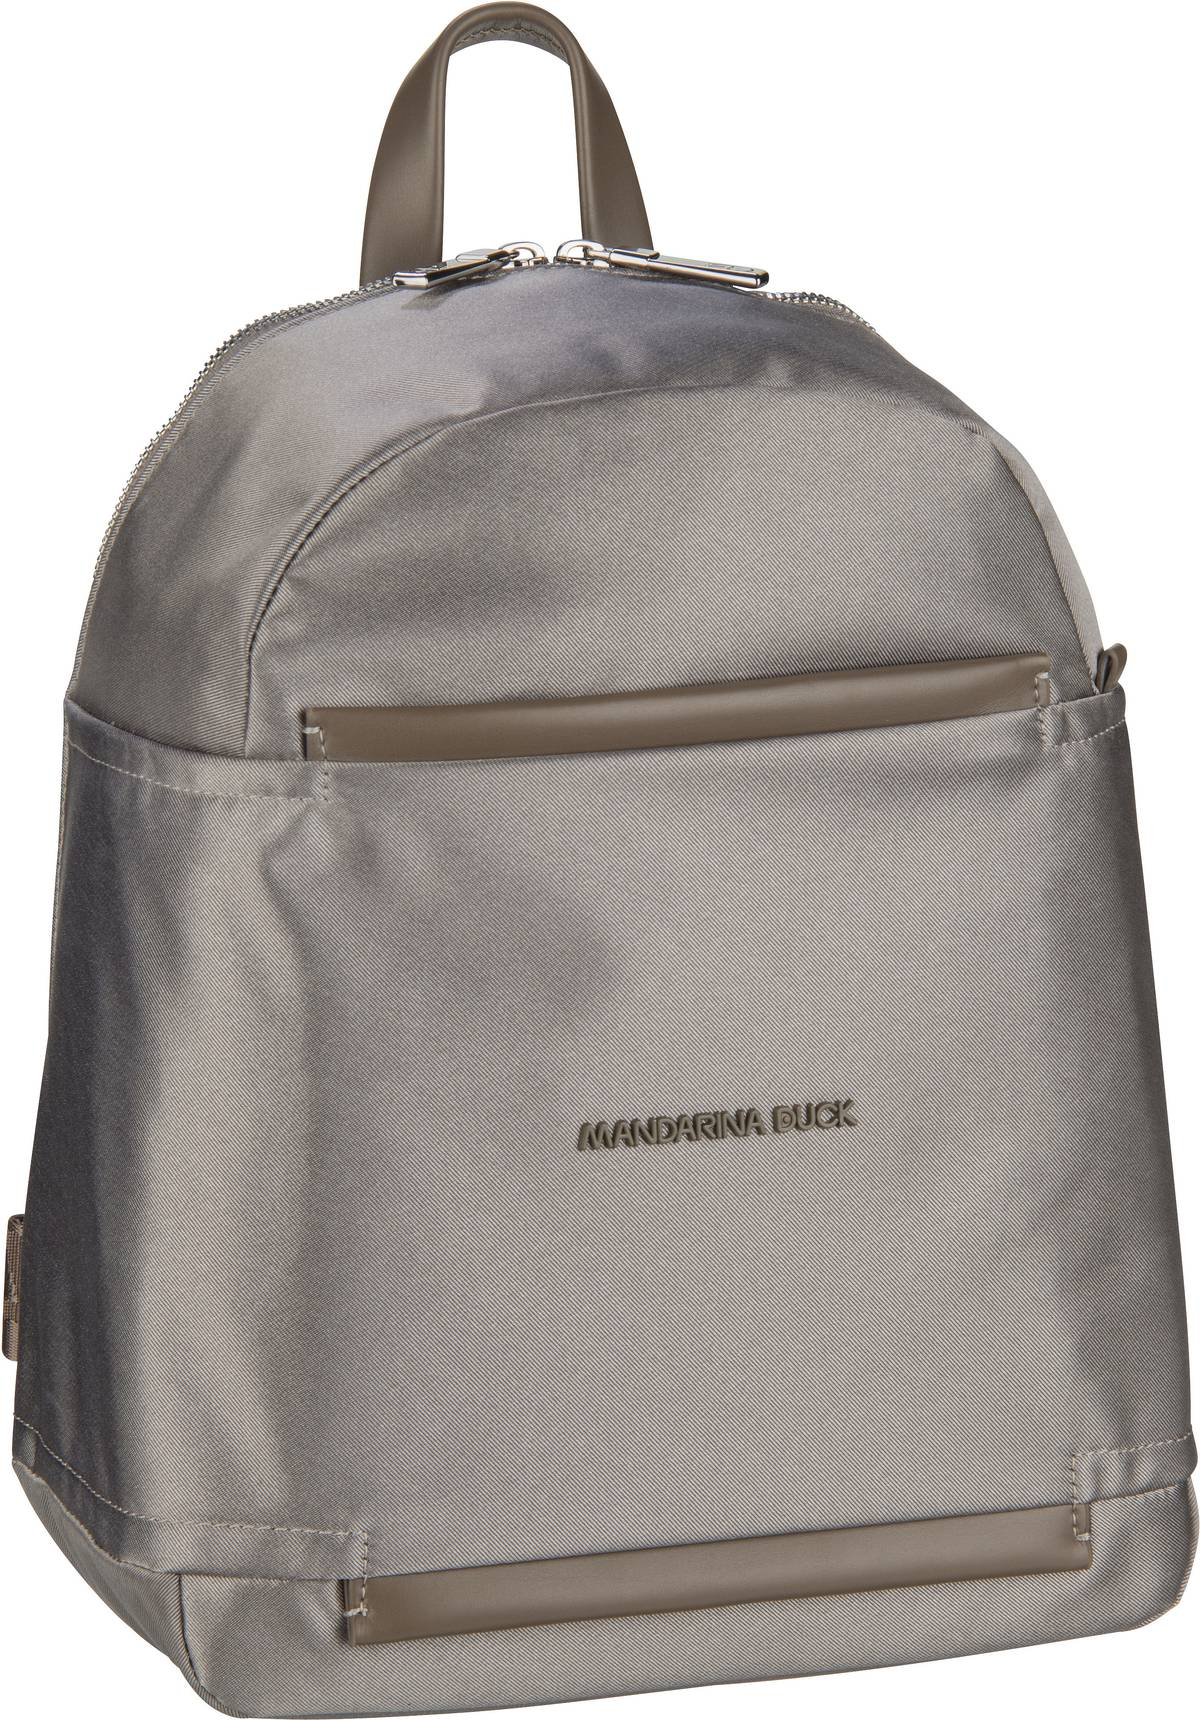 Rucksack / Daypack Daphne Backpack PDT03 Gun Metal